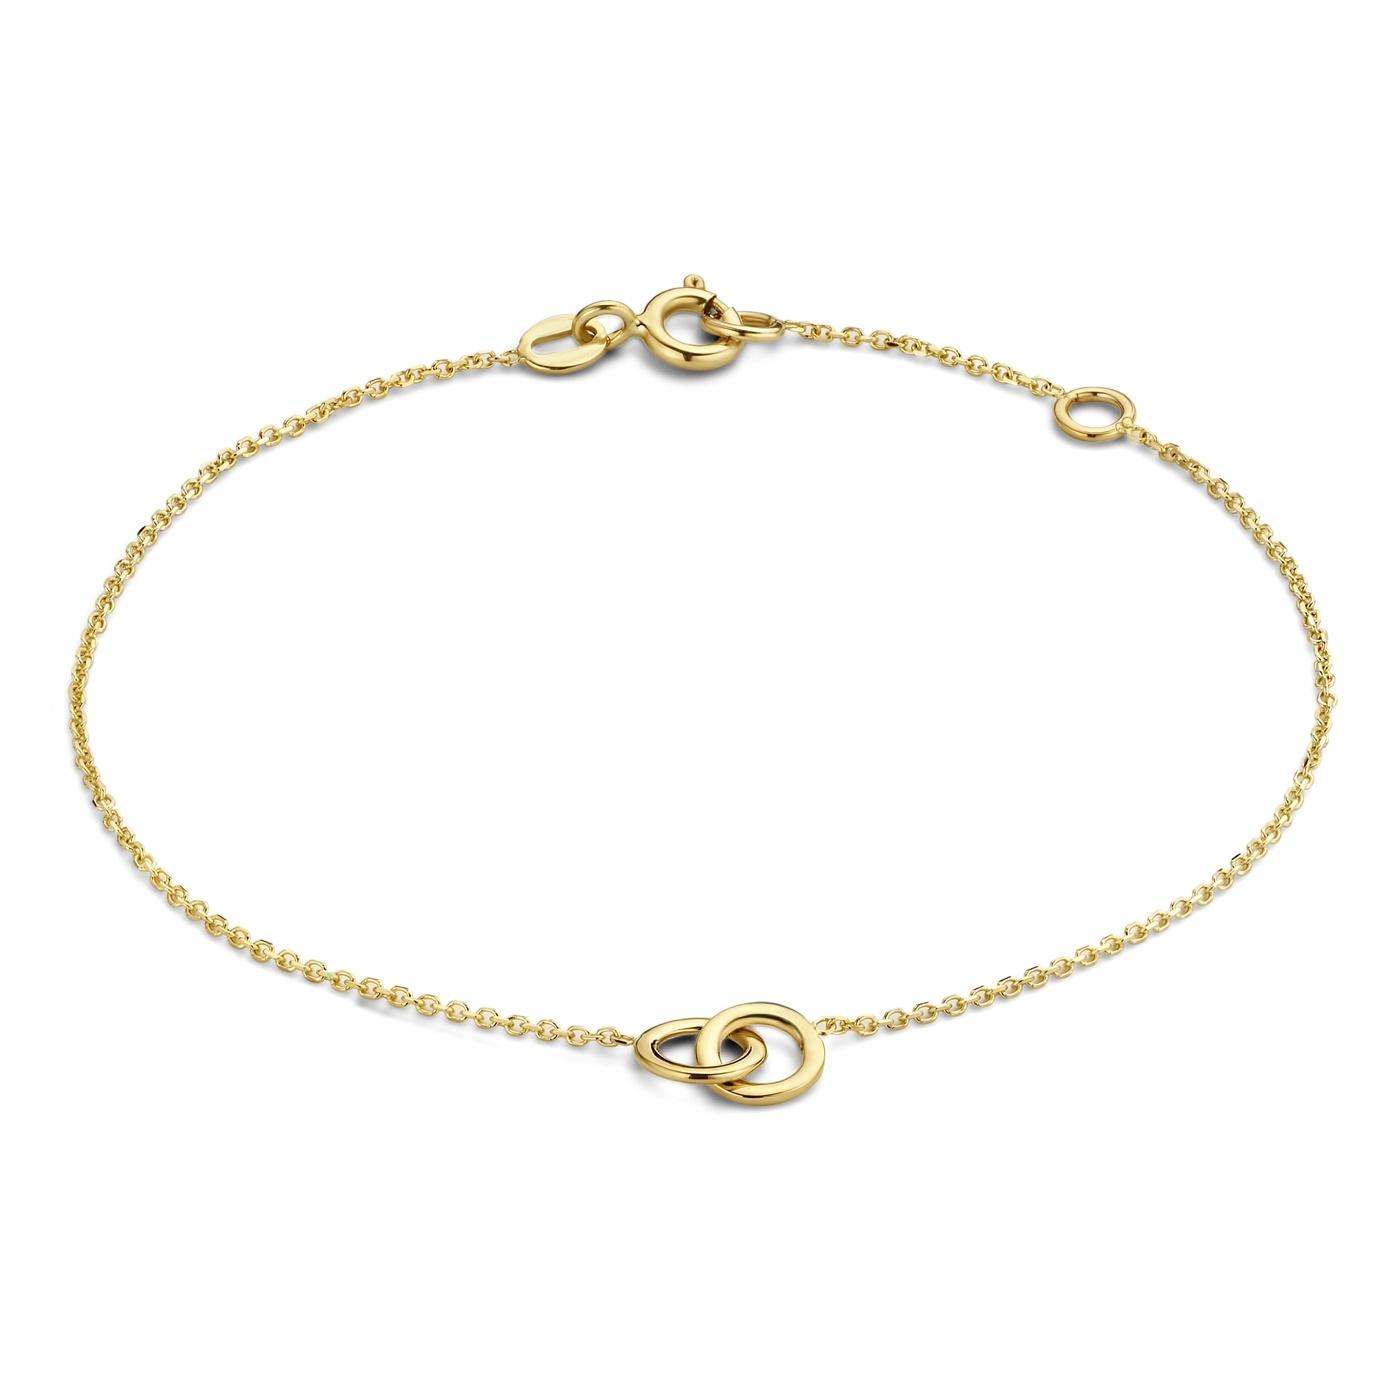 Isabel Bernard Le Marais Noémie 14 karaat gouden armband met ringetjes